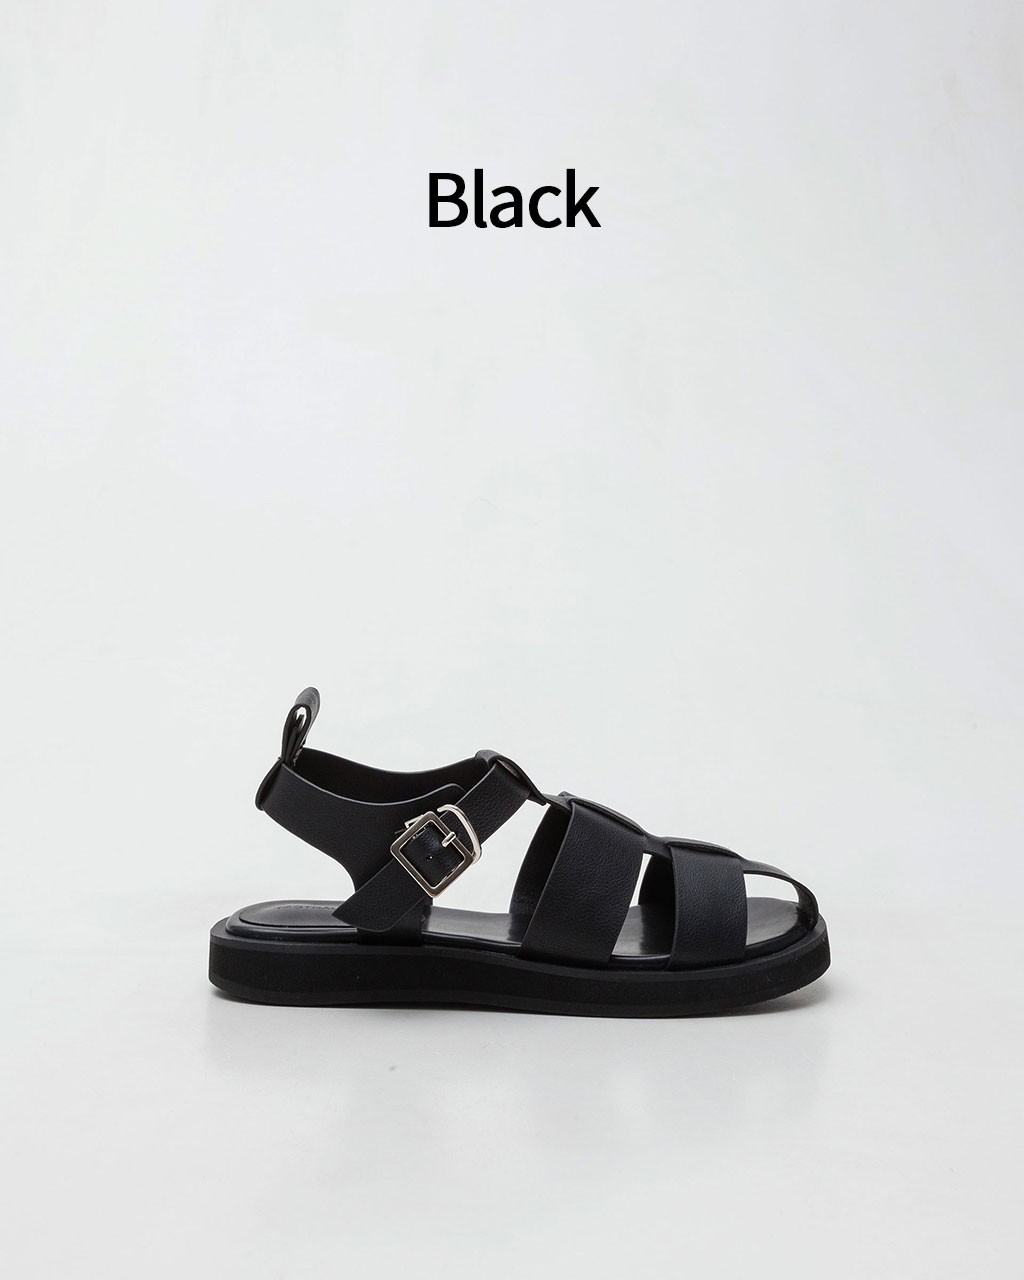 Tagtraume Lagoon - Black(블랙)